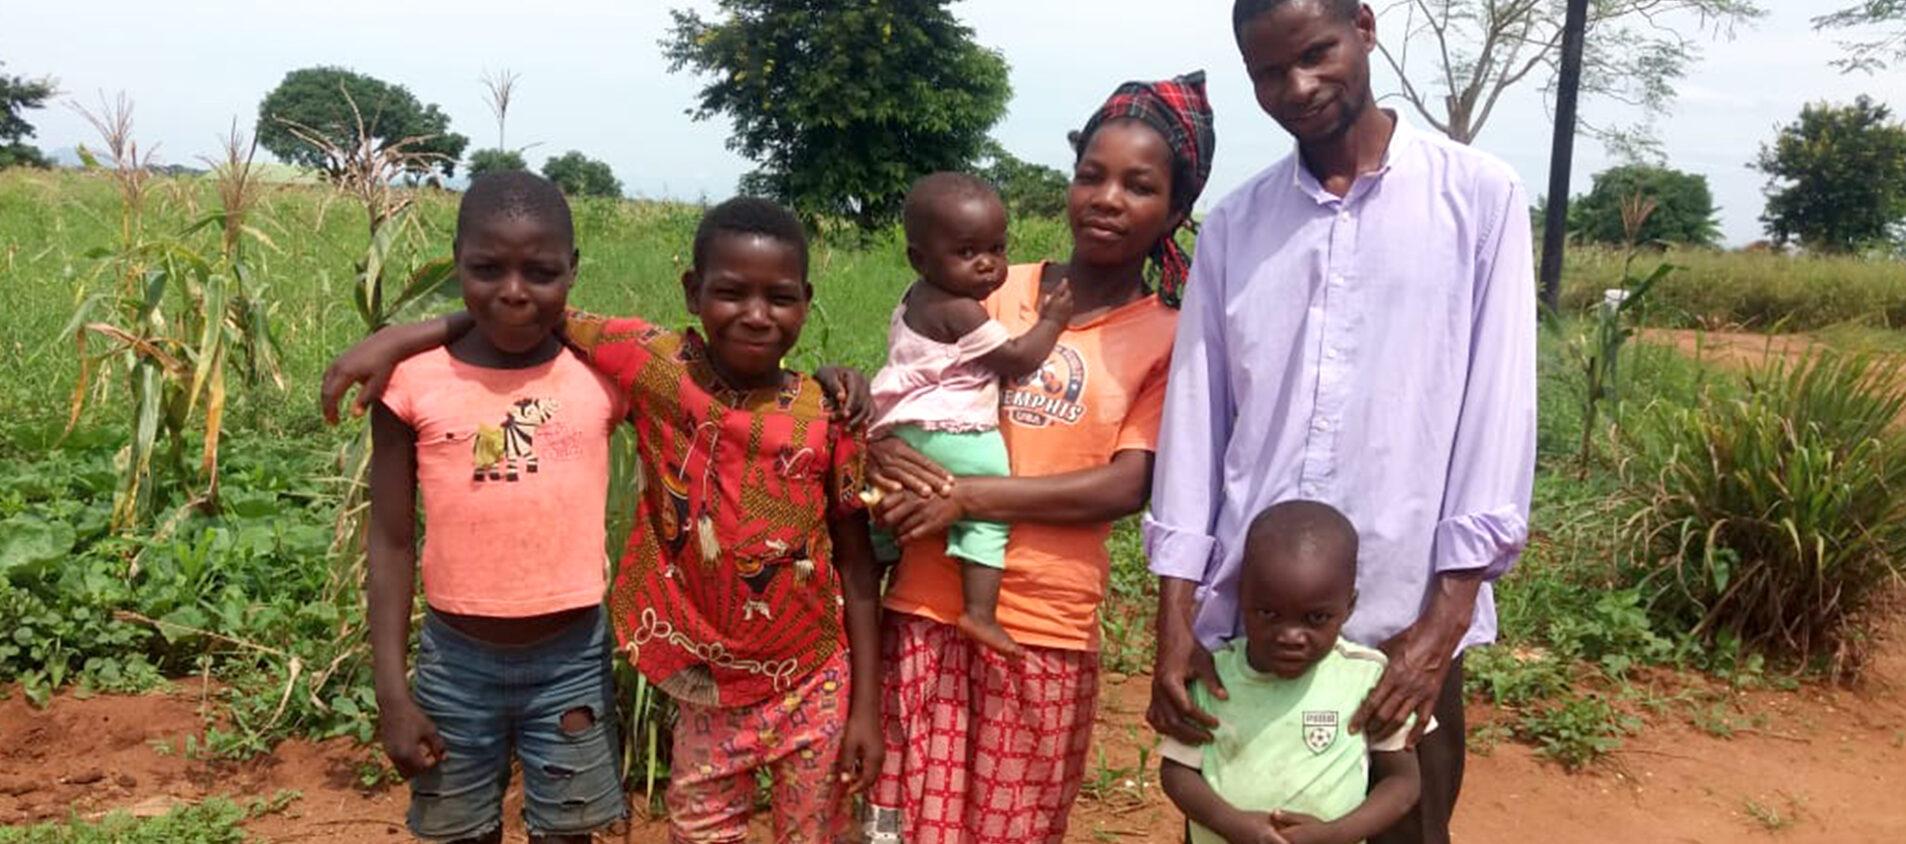 Luisas familj i Mocambique